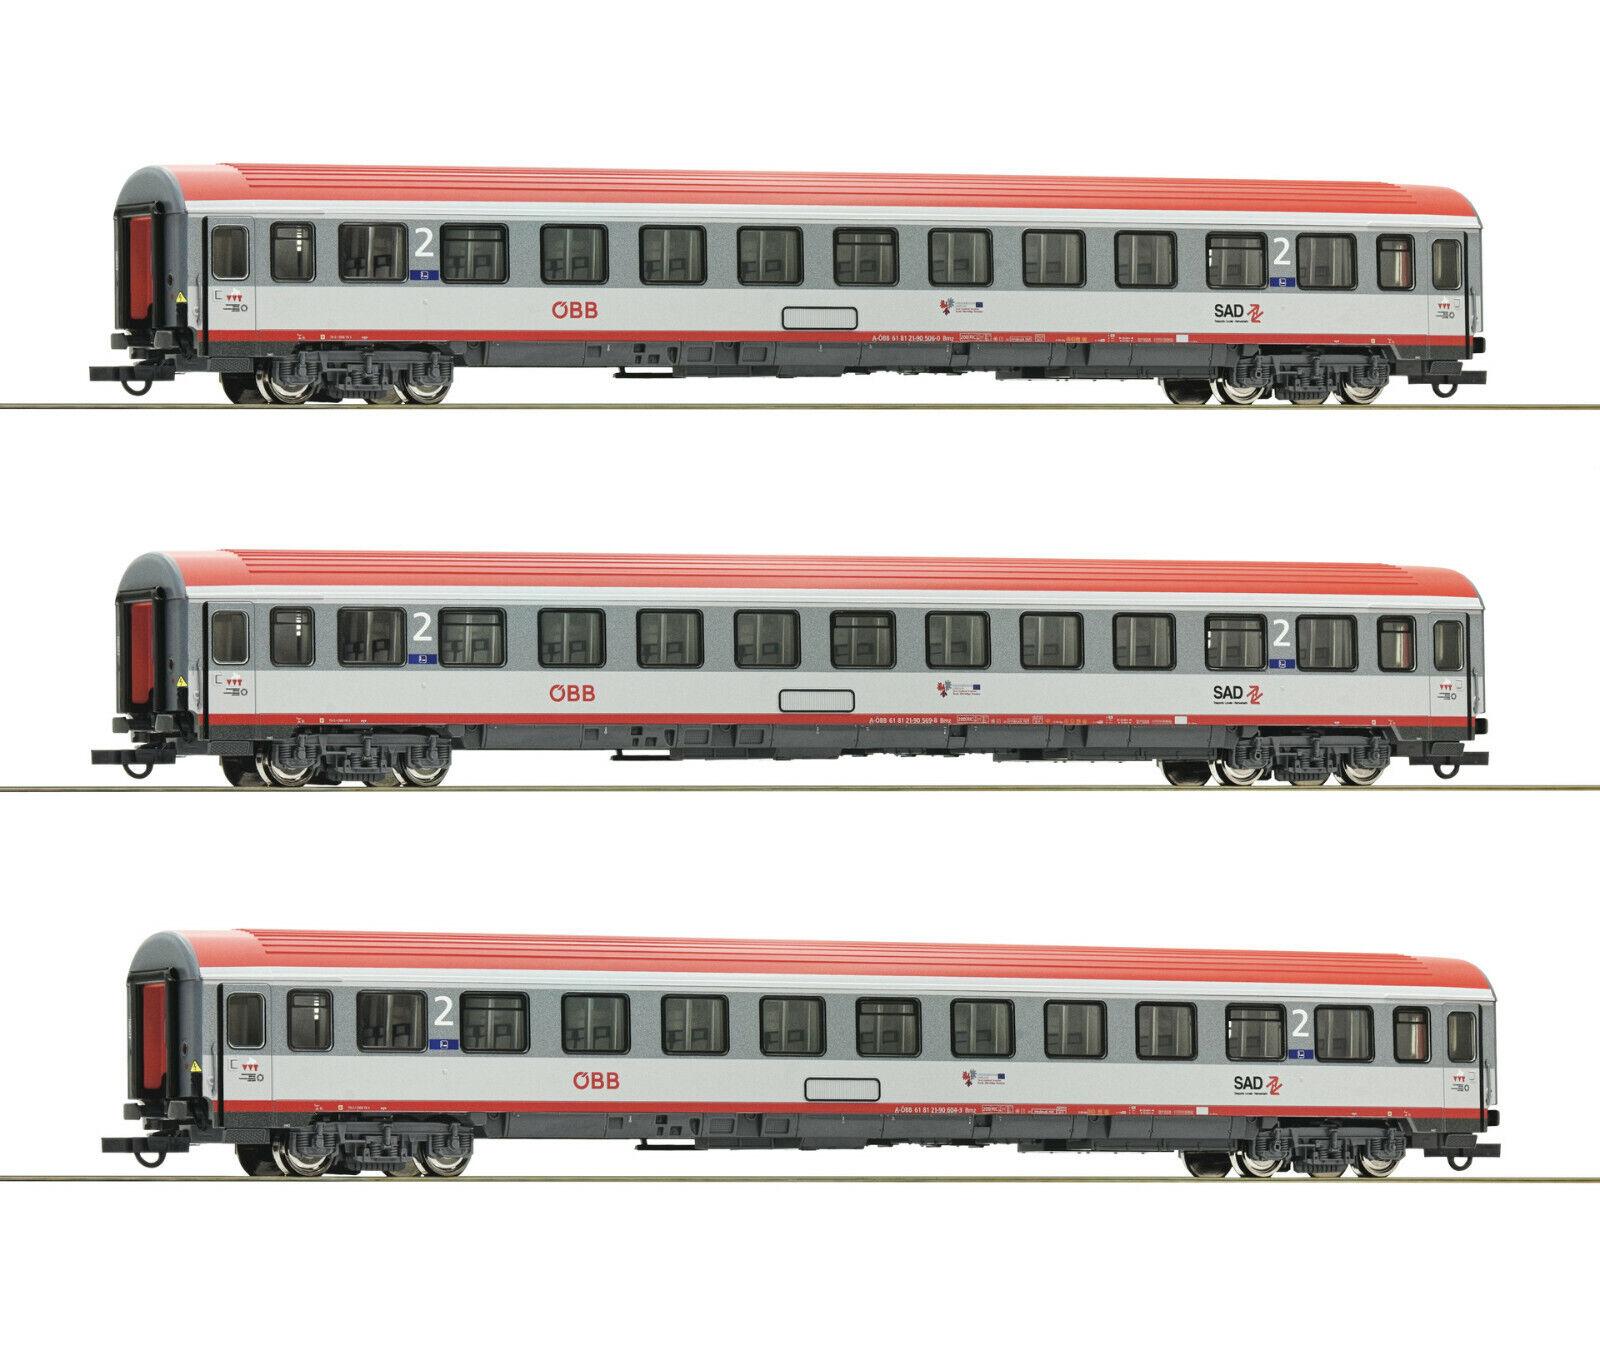 Roco h0 74132 - 3 unid set  regional Express Innsbruck-Bolzano, ÖBB mercancía nueva